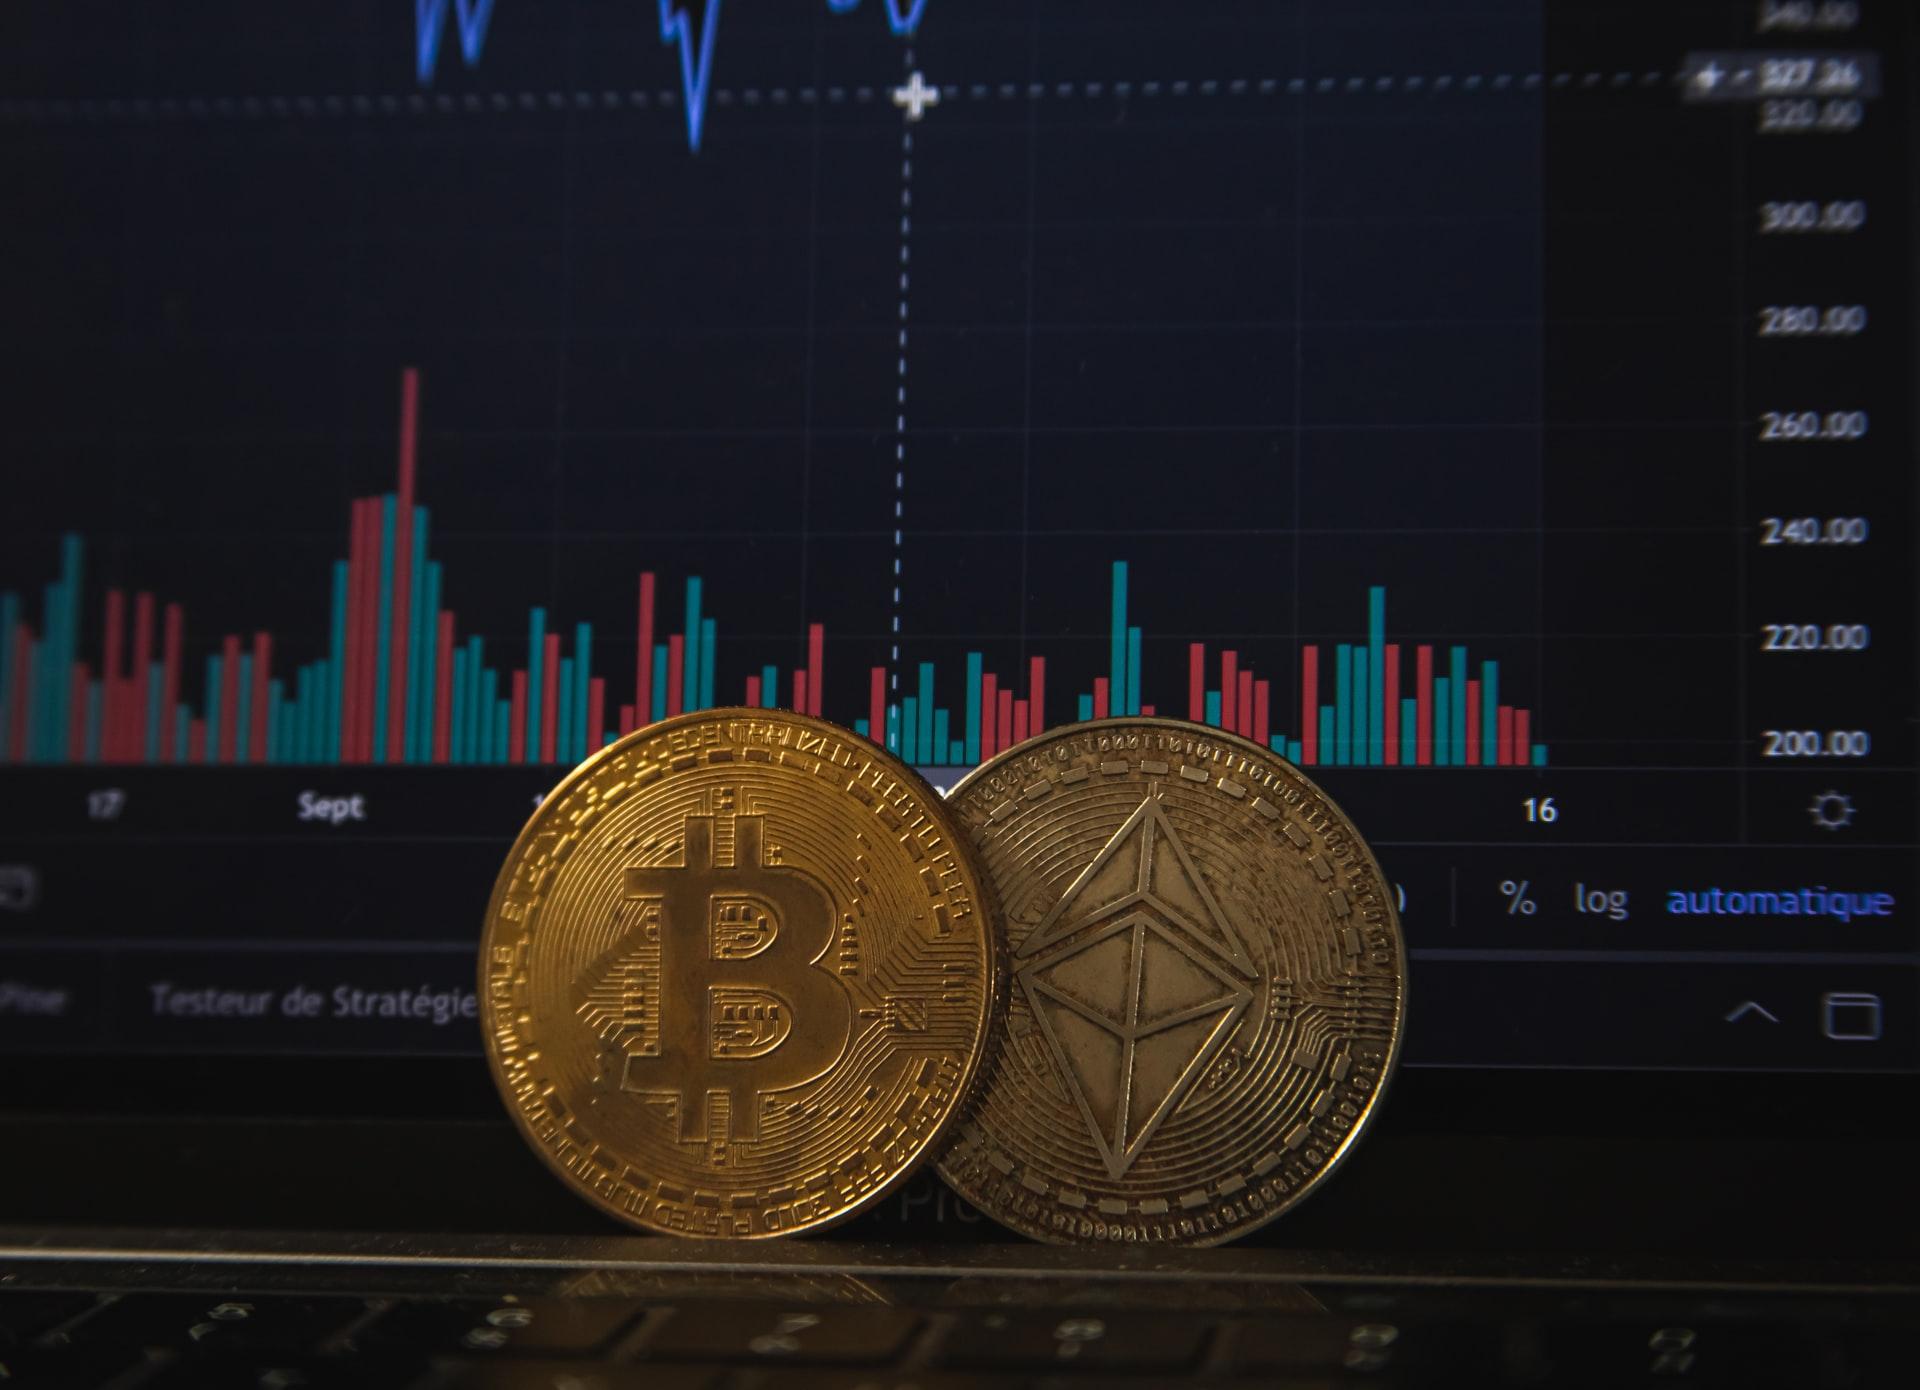 Du kan investere online